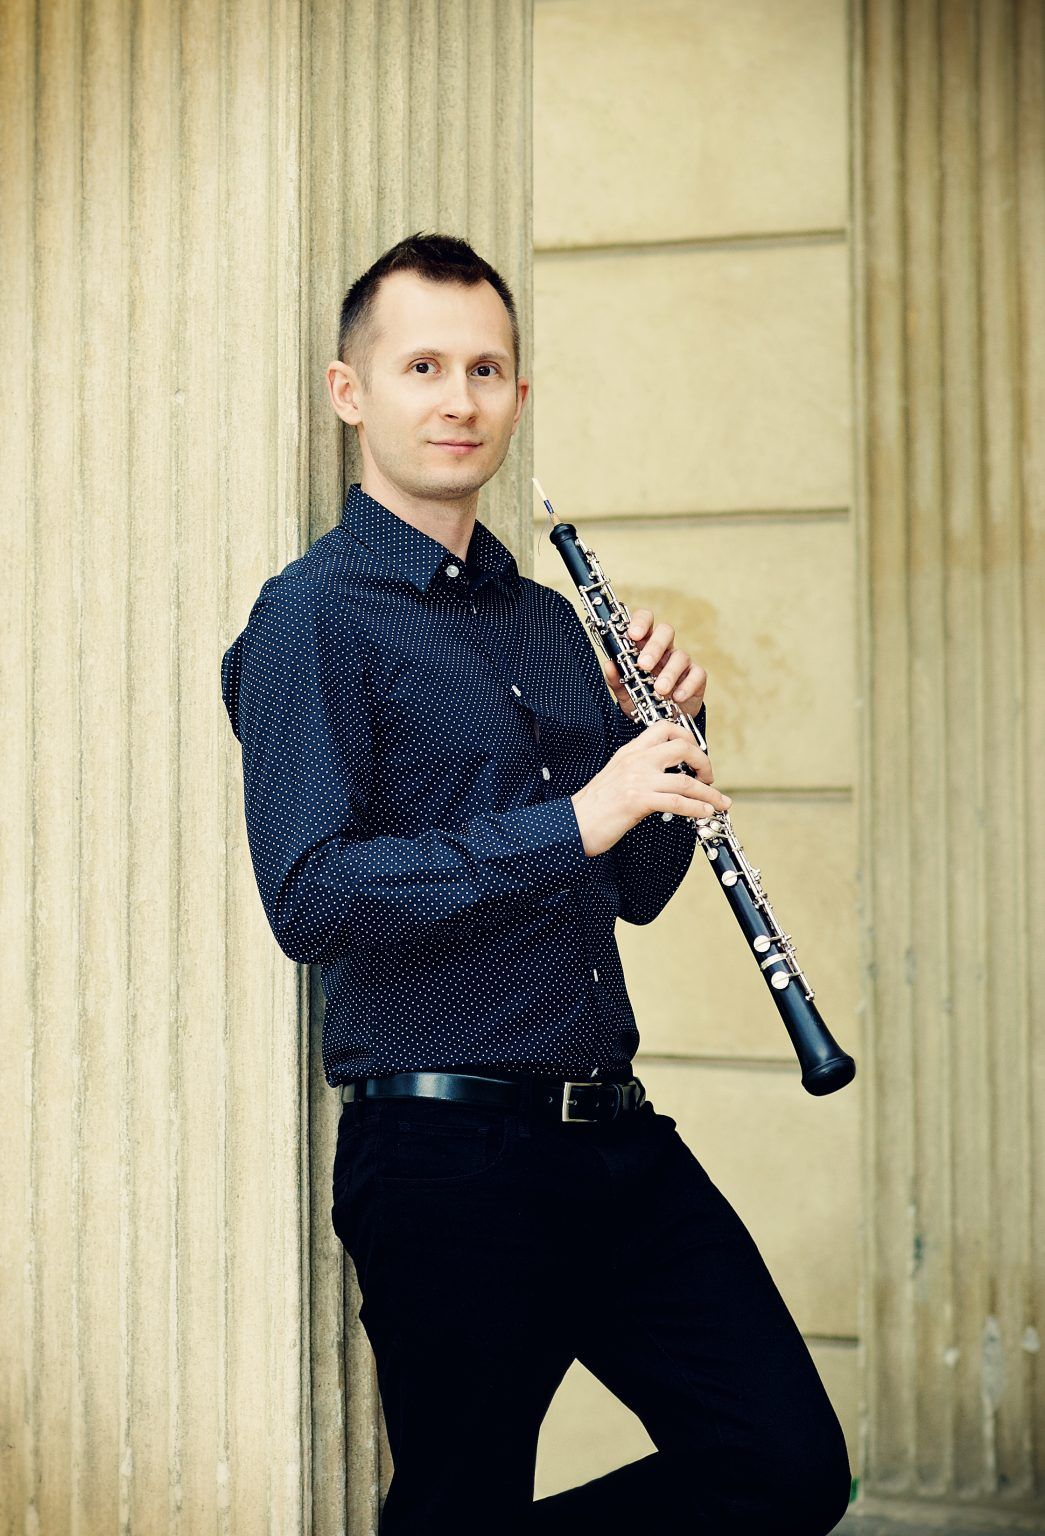 Portrait of oboist Michal Rogalski